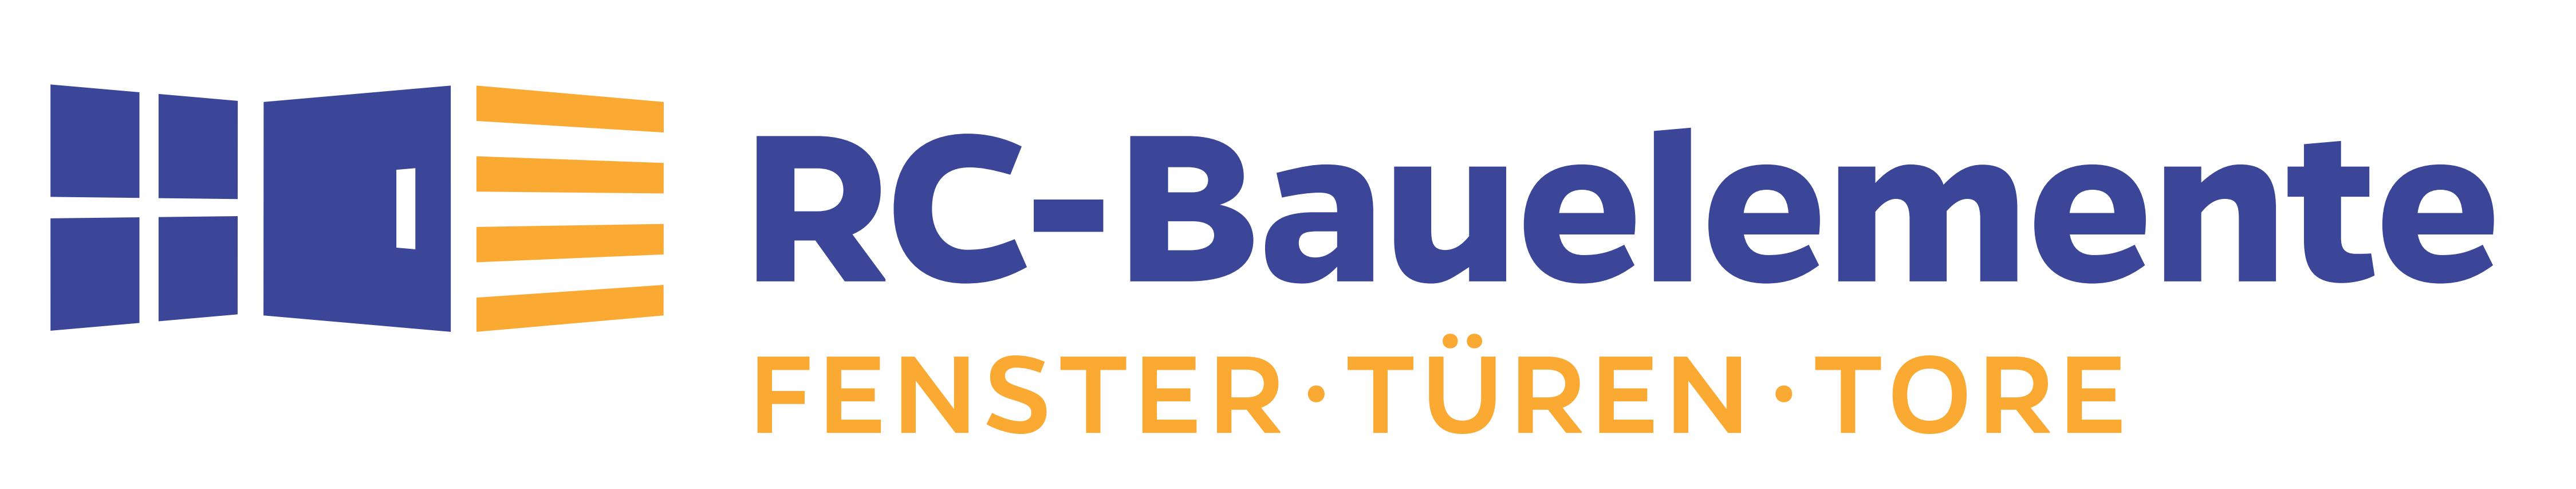 RC Bauelemente GmbH Dietmar Petereit